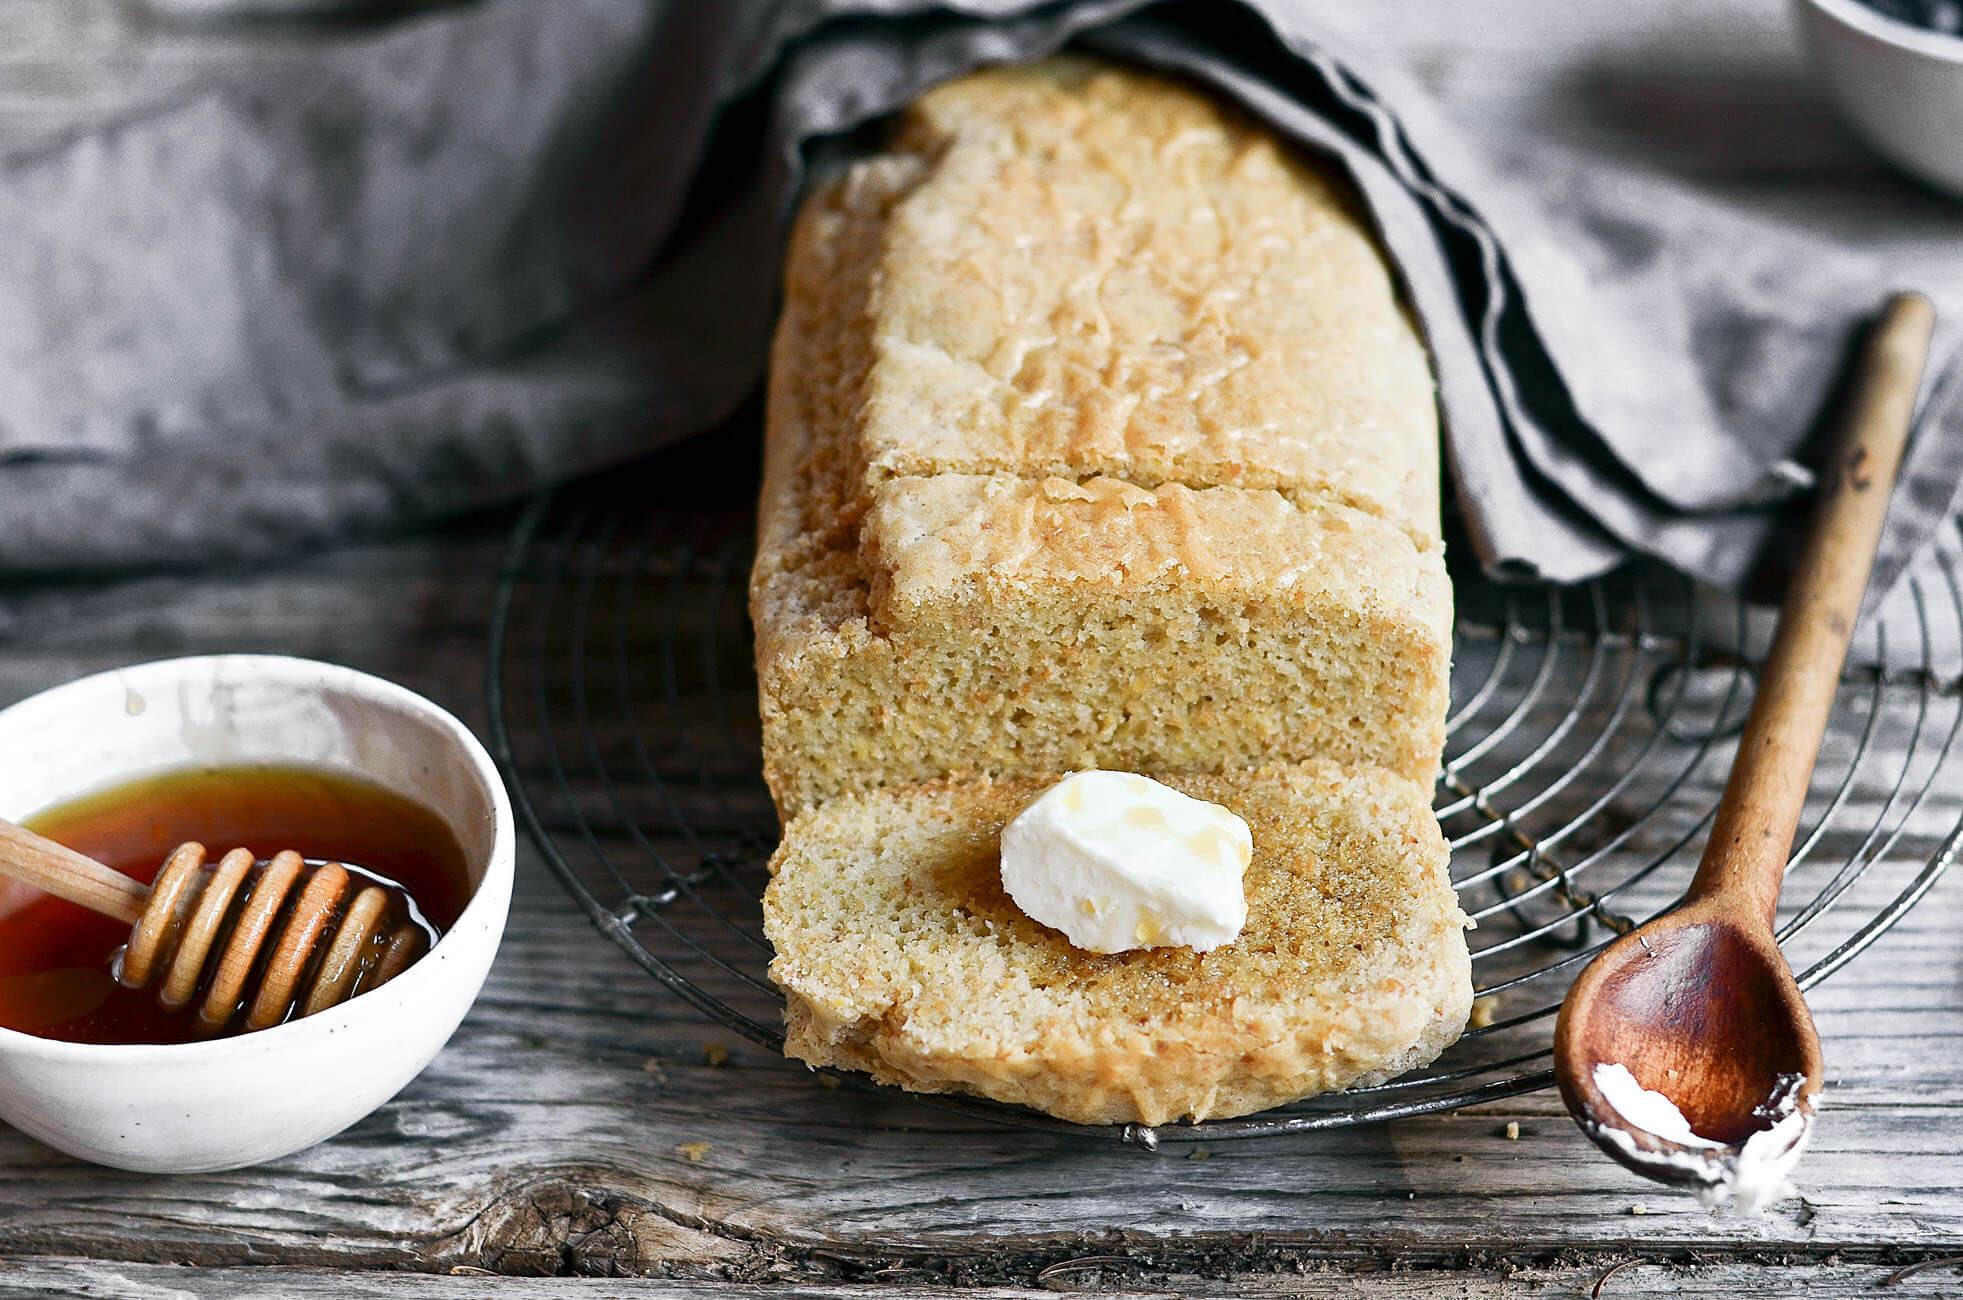 Healthy Gluten Free Bread  Healthy 5 Minute Gluten Free Paleo Bread Paleo Gluten